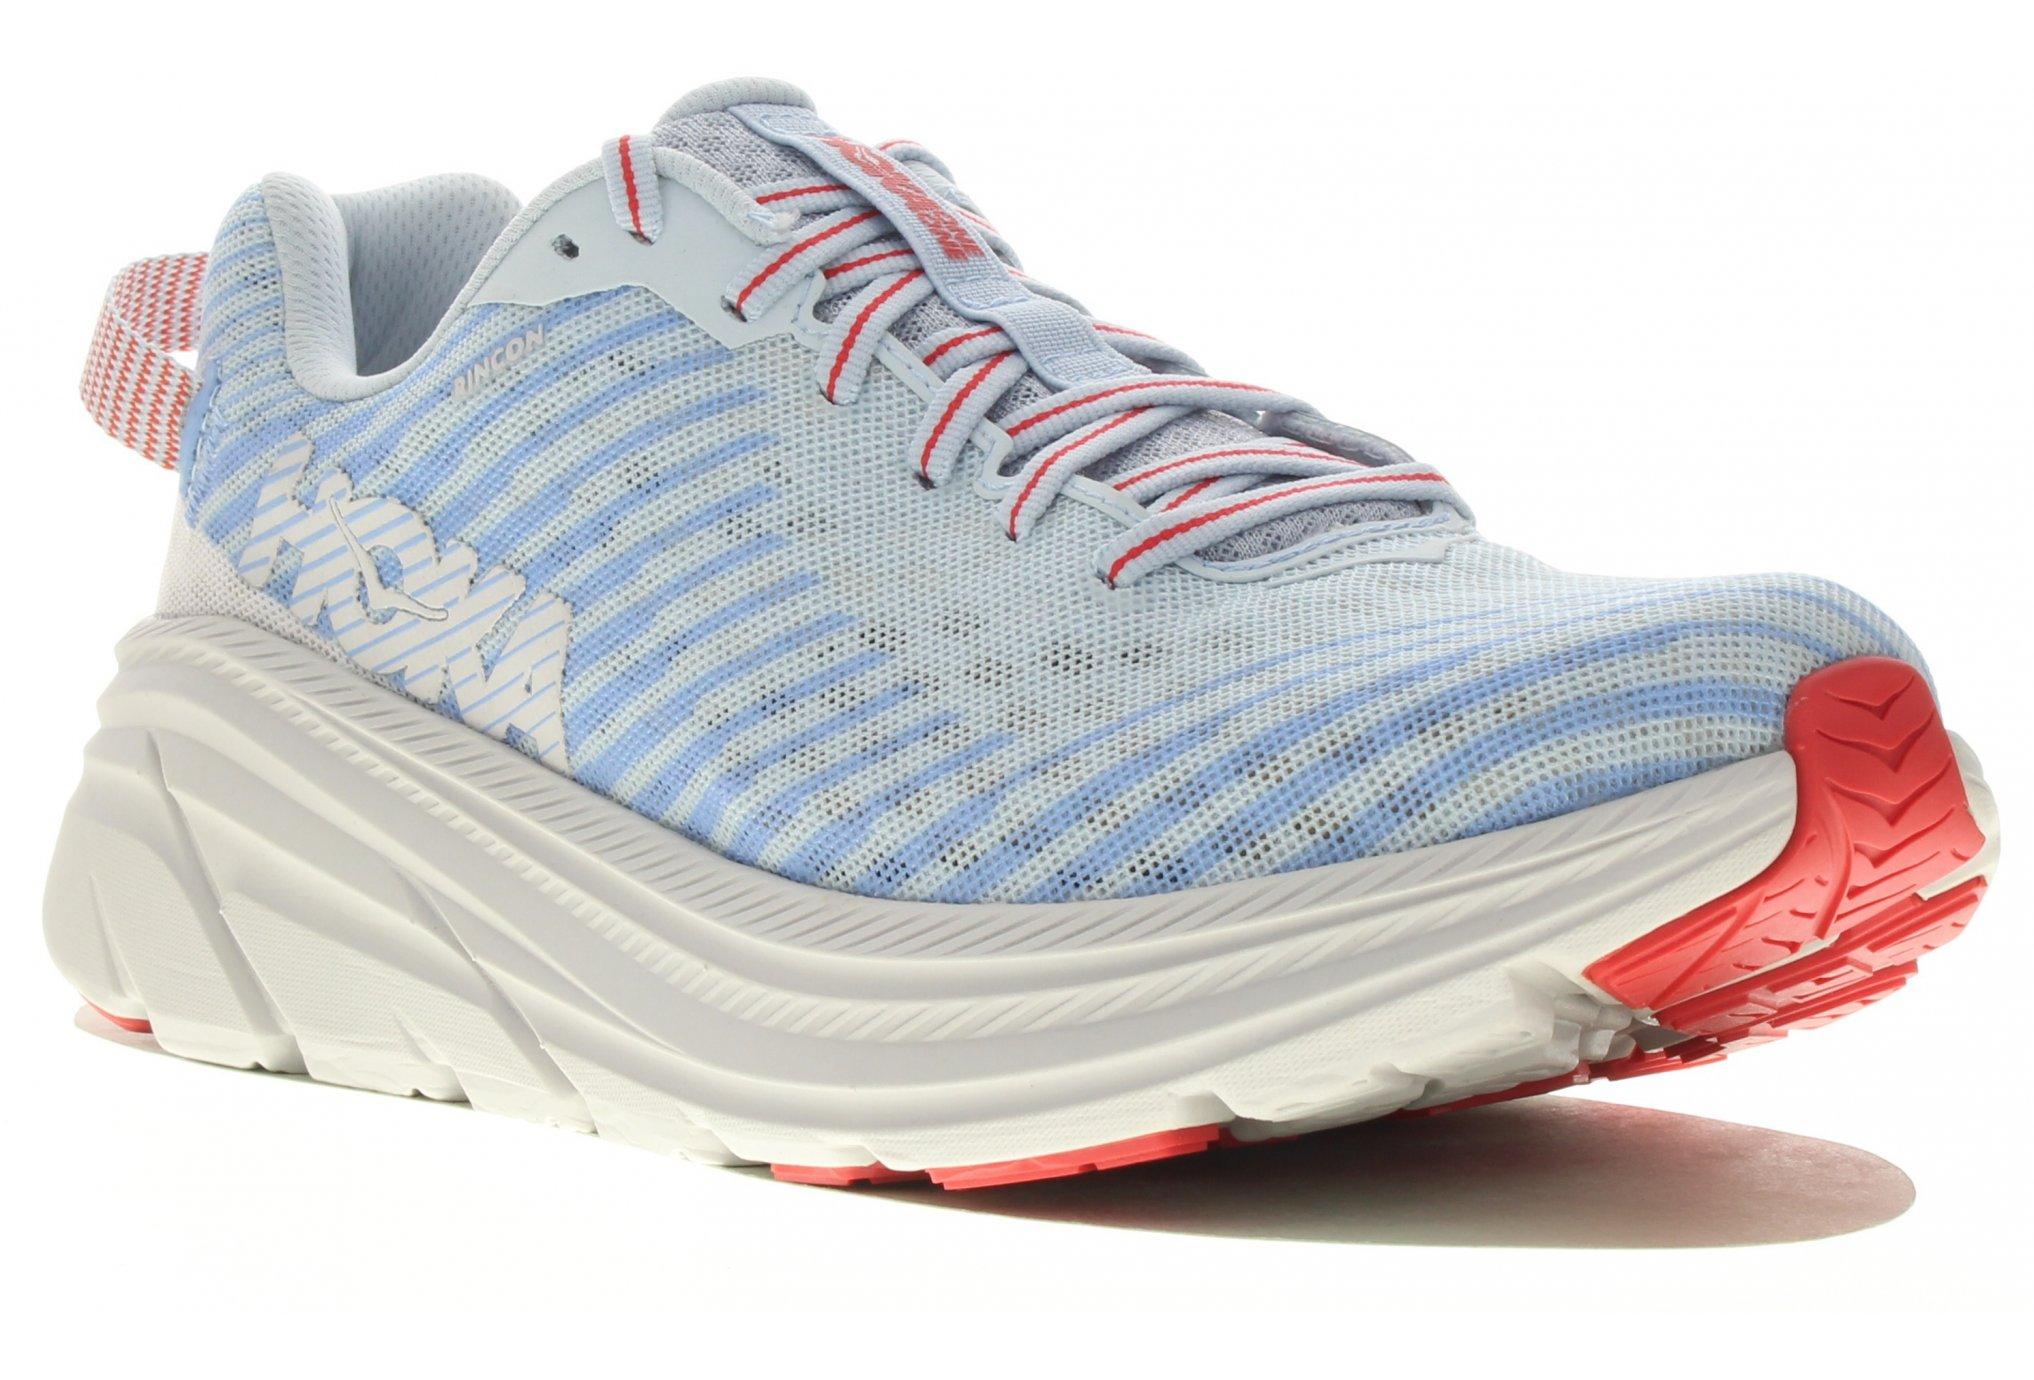 Hoka One One Rincon Chaussures running femme